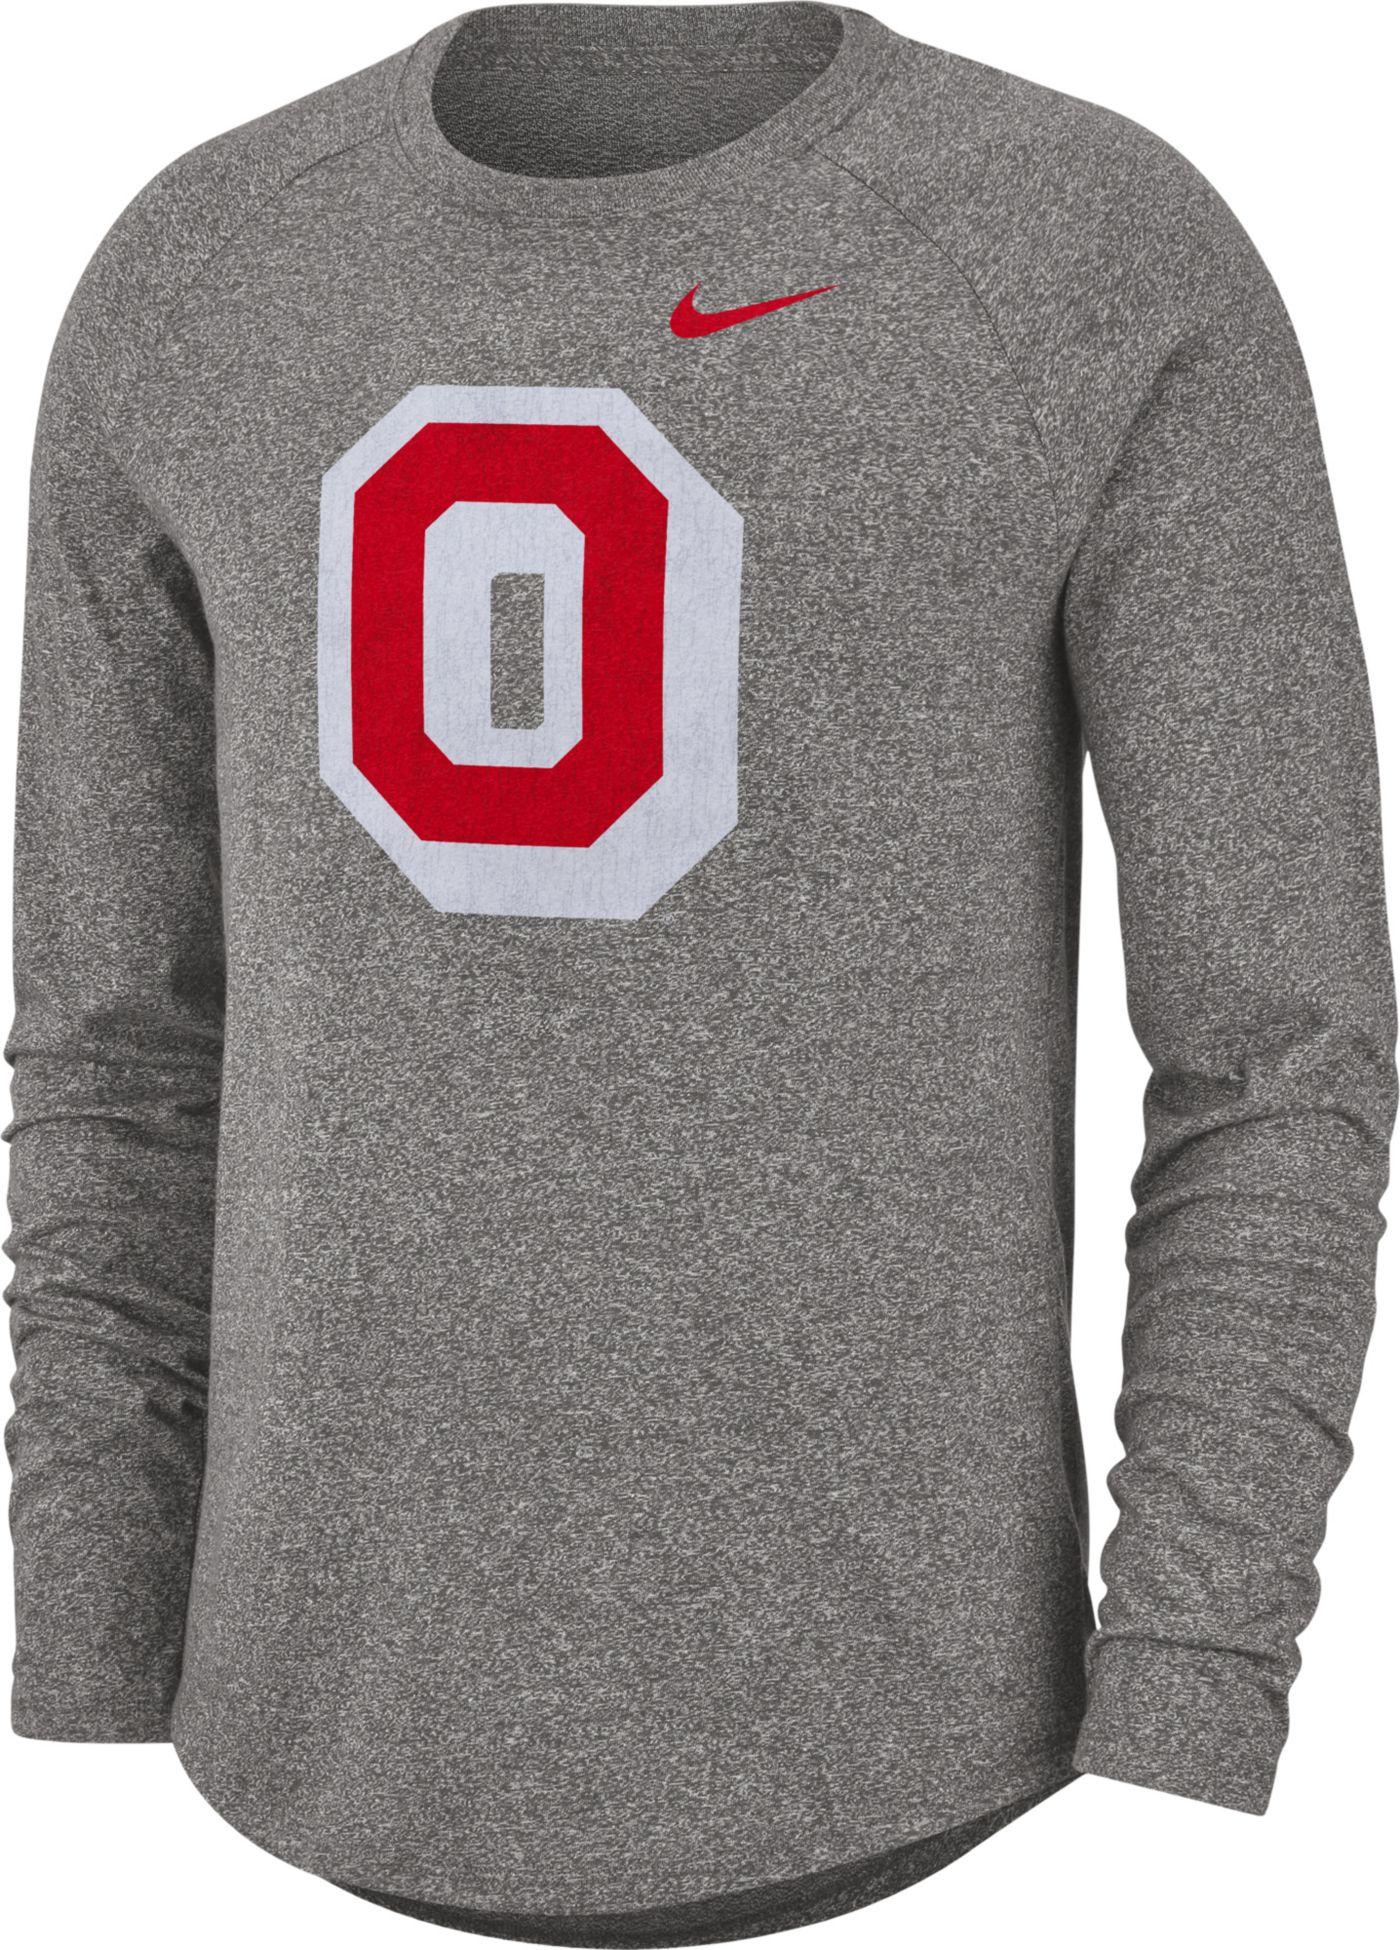 Nike Men's Ohio State Buckeyes Gray Marled Raglan Long Sleeve T-Shirt